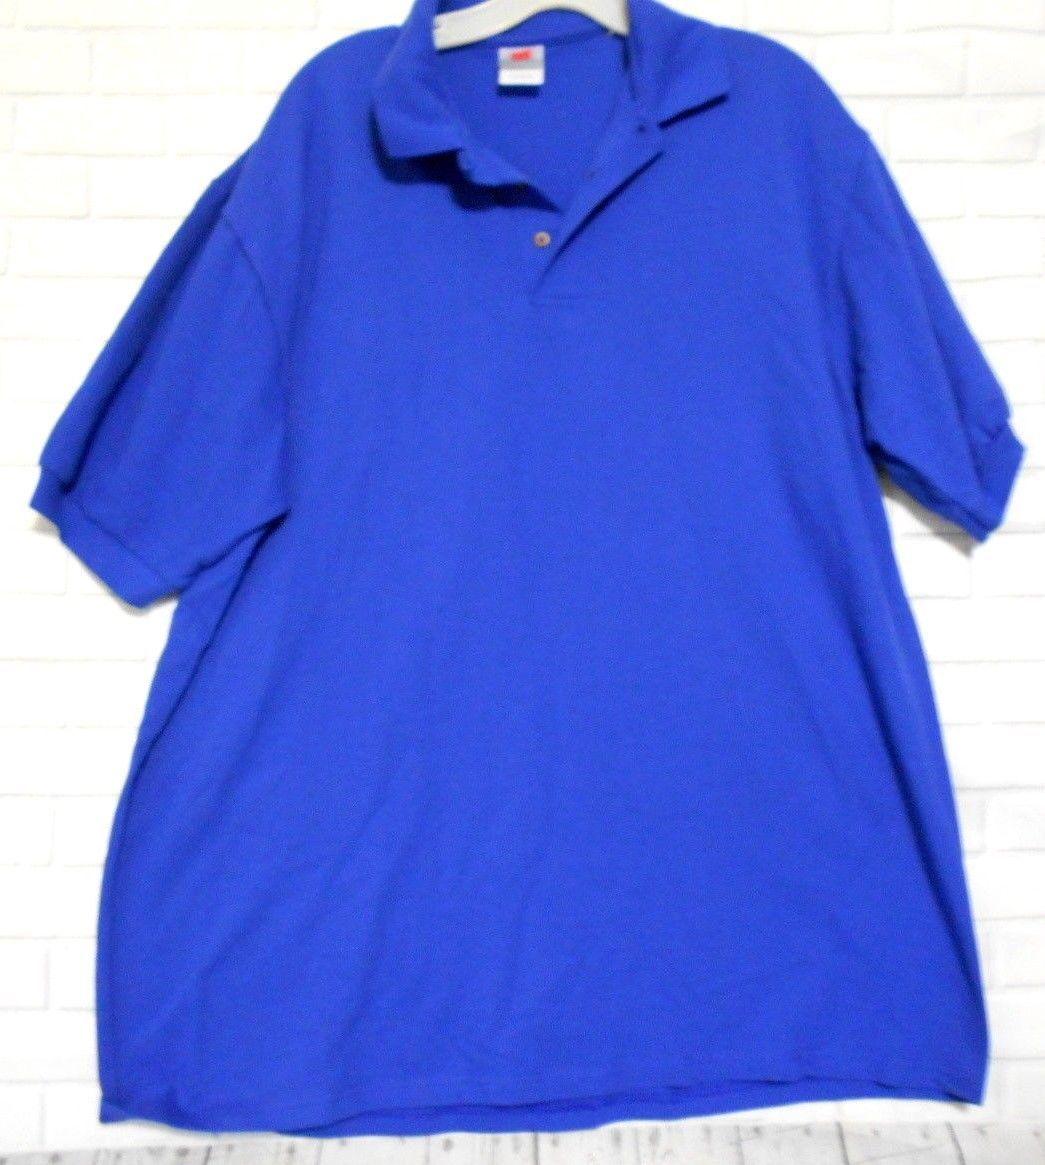 Hanes Stedman Blue Cotton XL 46-48 Short Sleeve Three Henley  Polo Golf Shirt - £9.11 GBP